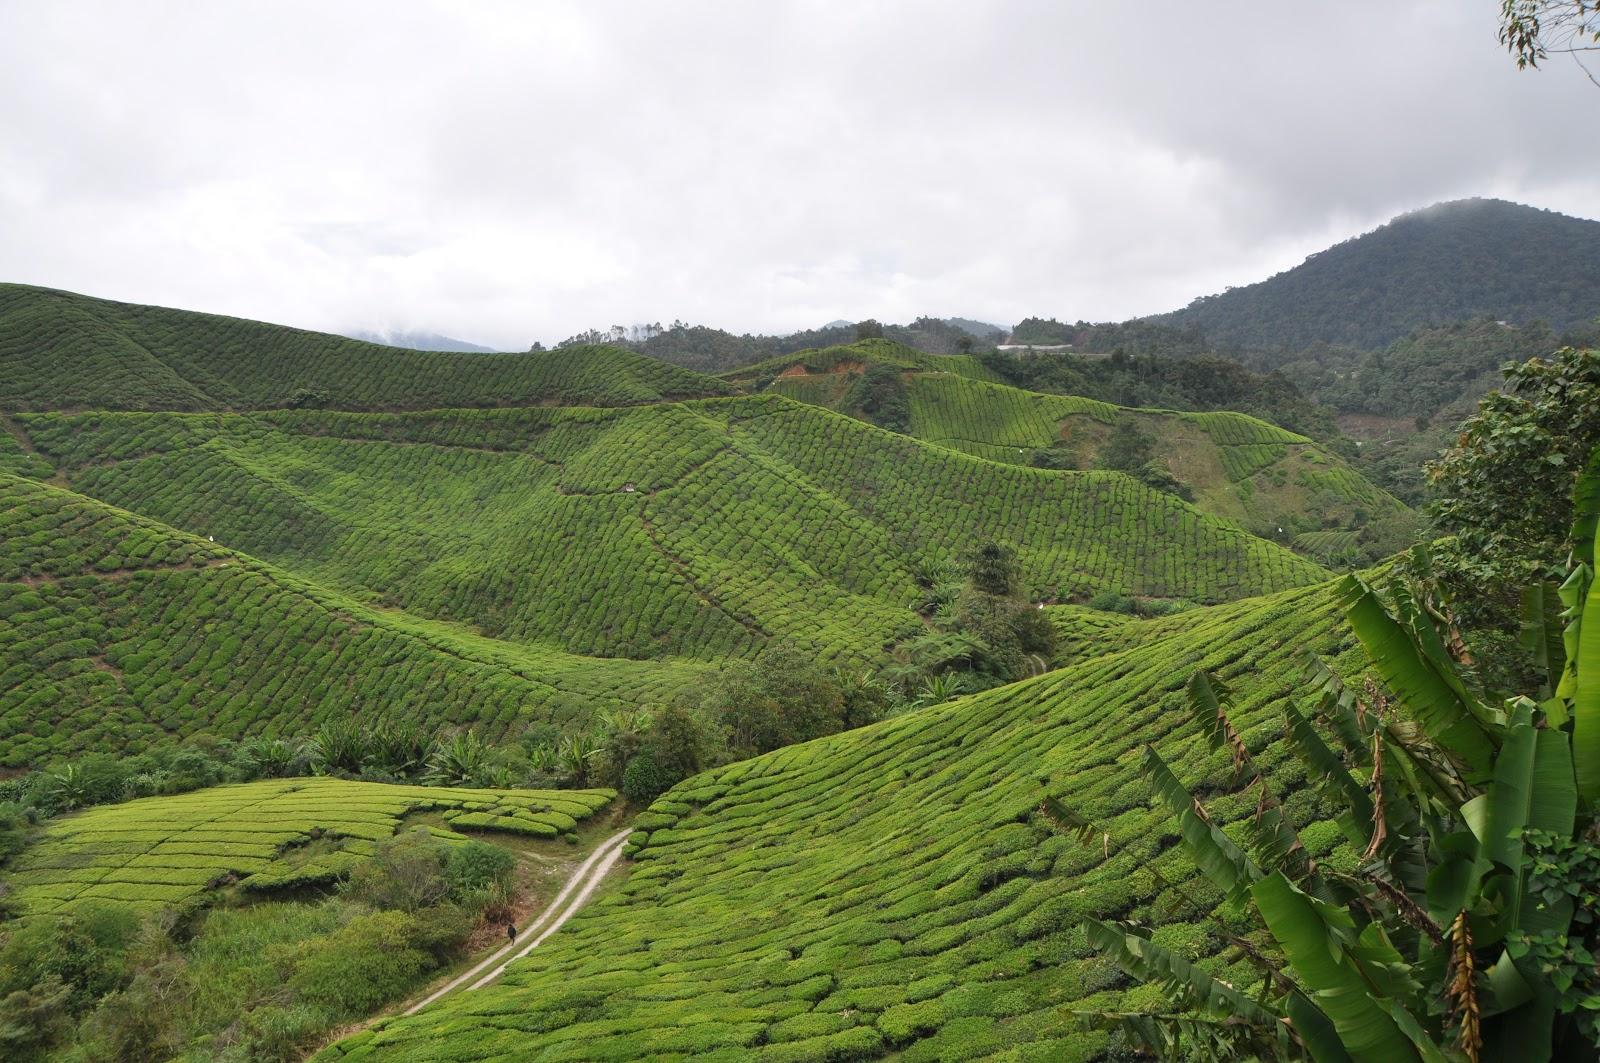 cameron-highlands-tea-plantation-cloudy-malaysia